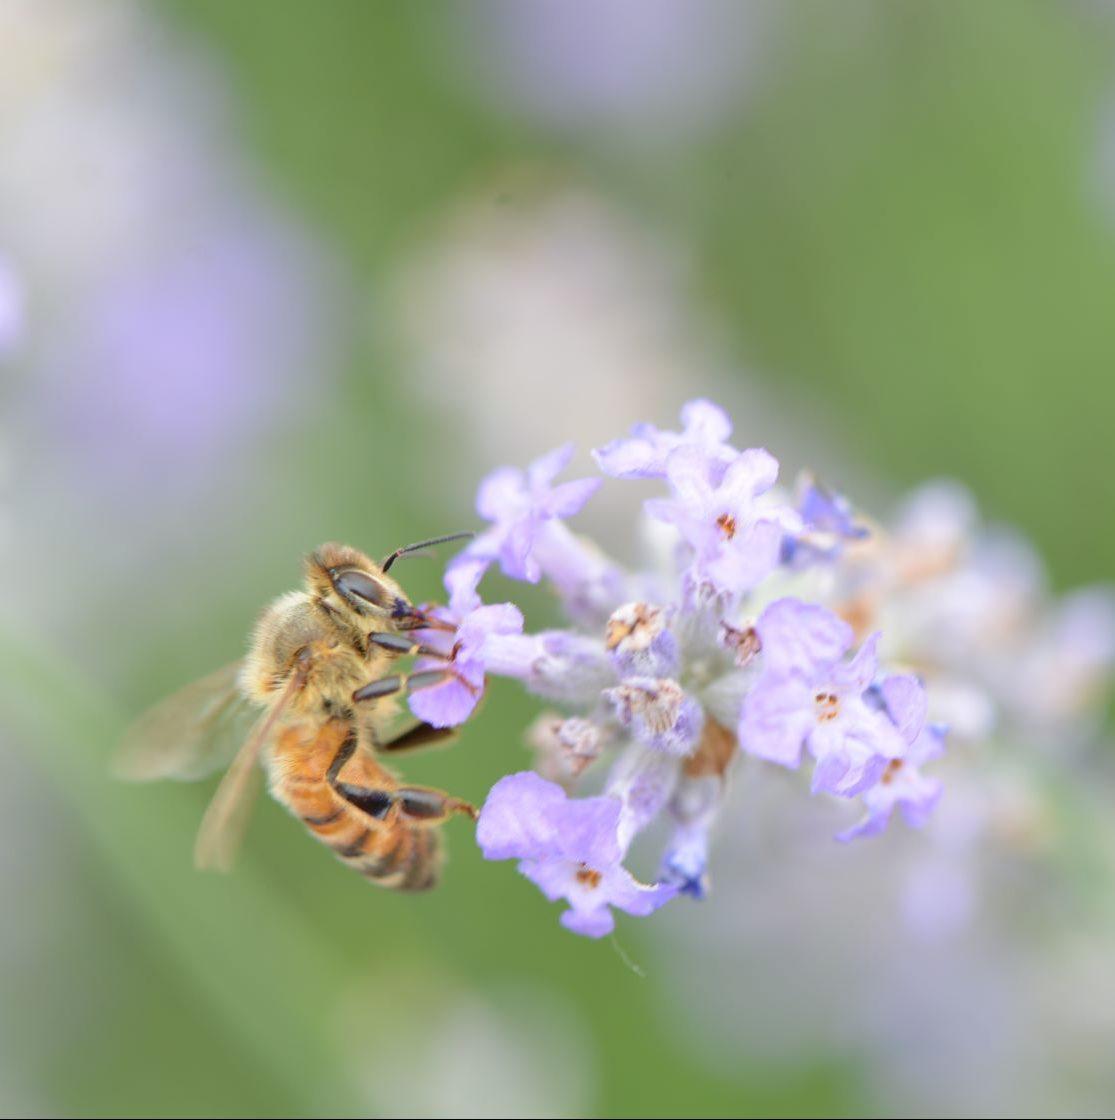 Pastel colours and lavender aromas